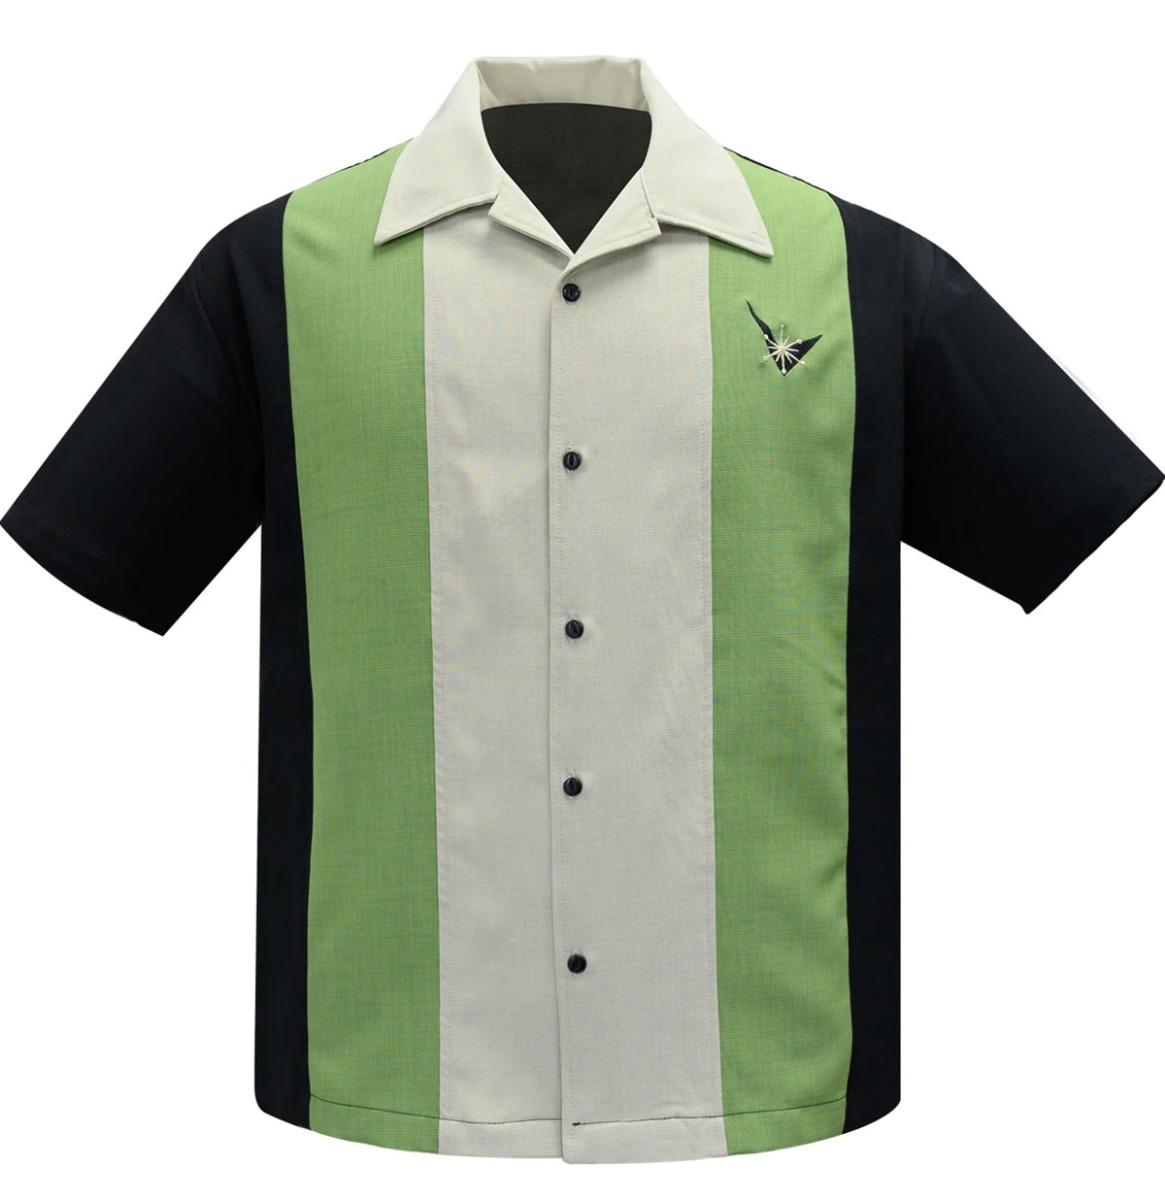 Steady Clothing Atomic Mad Men Shirt Zwart / Appel / Beige